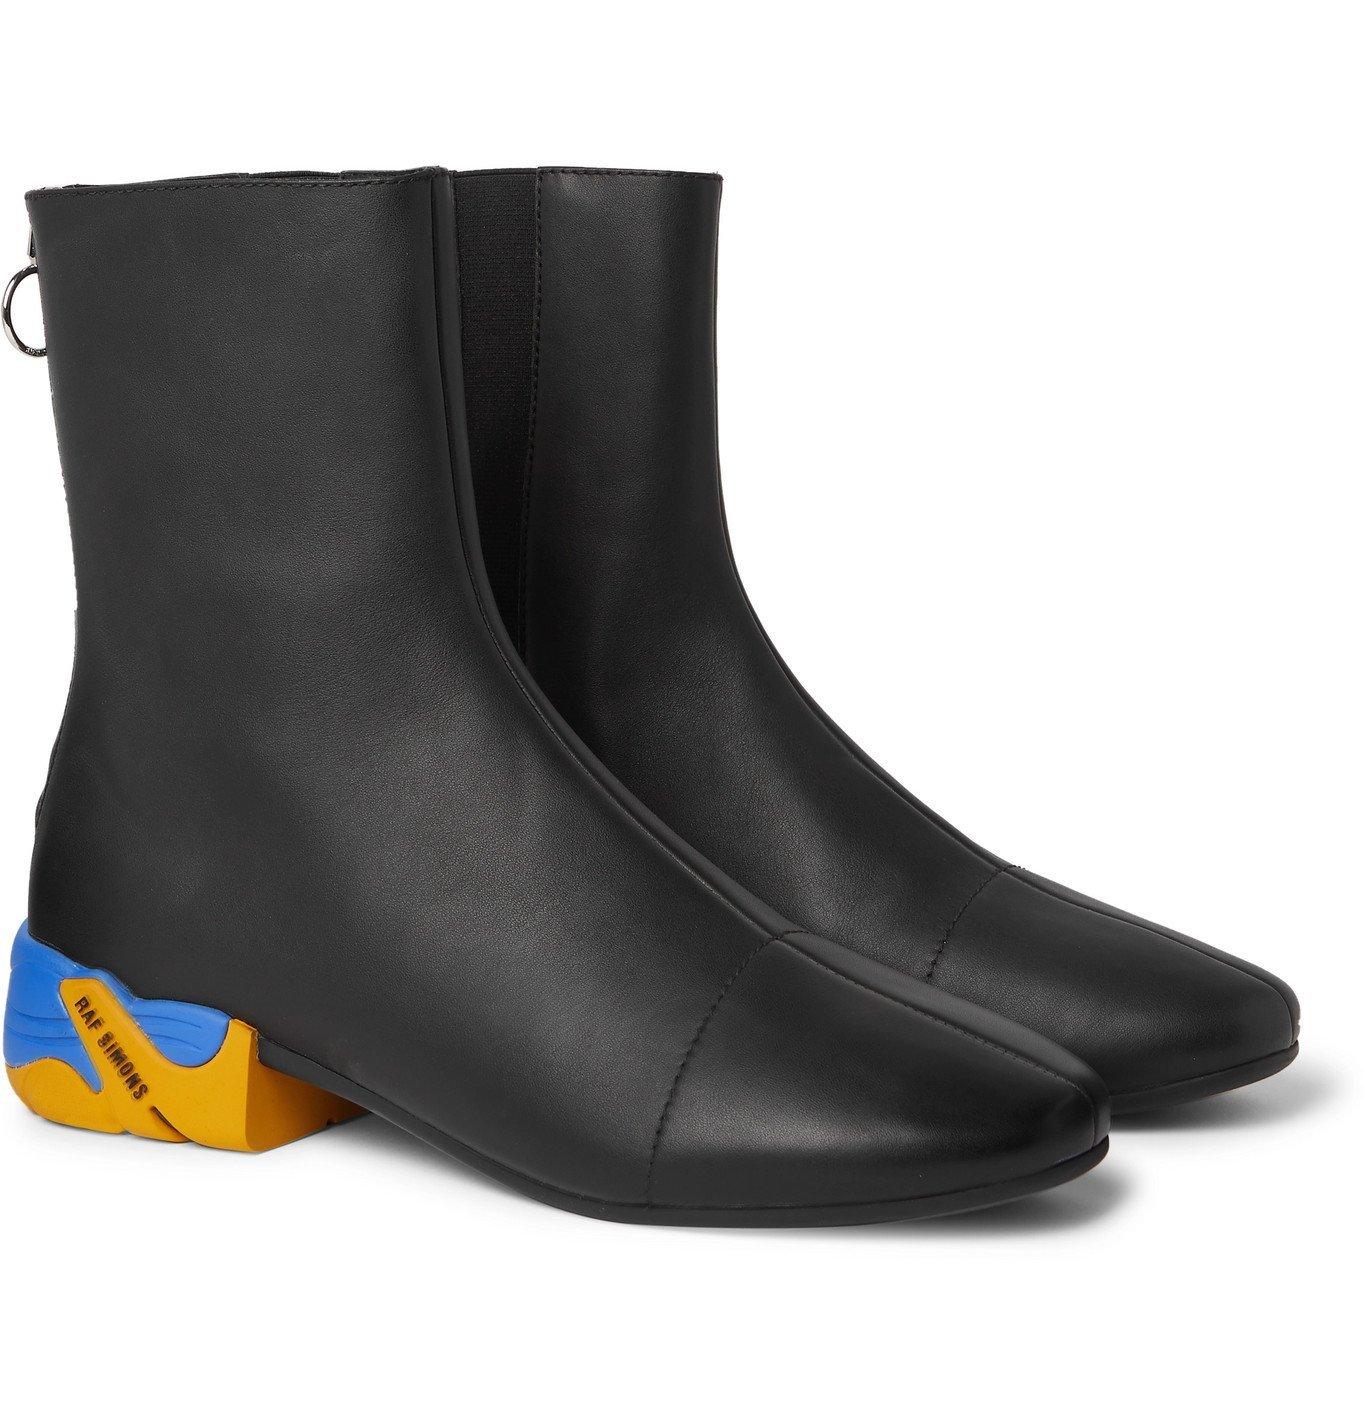 Raf Simons - Solaris-2 Leather Chelsea Boots - Black